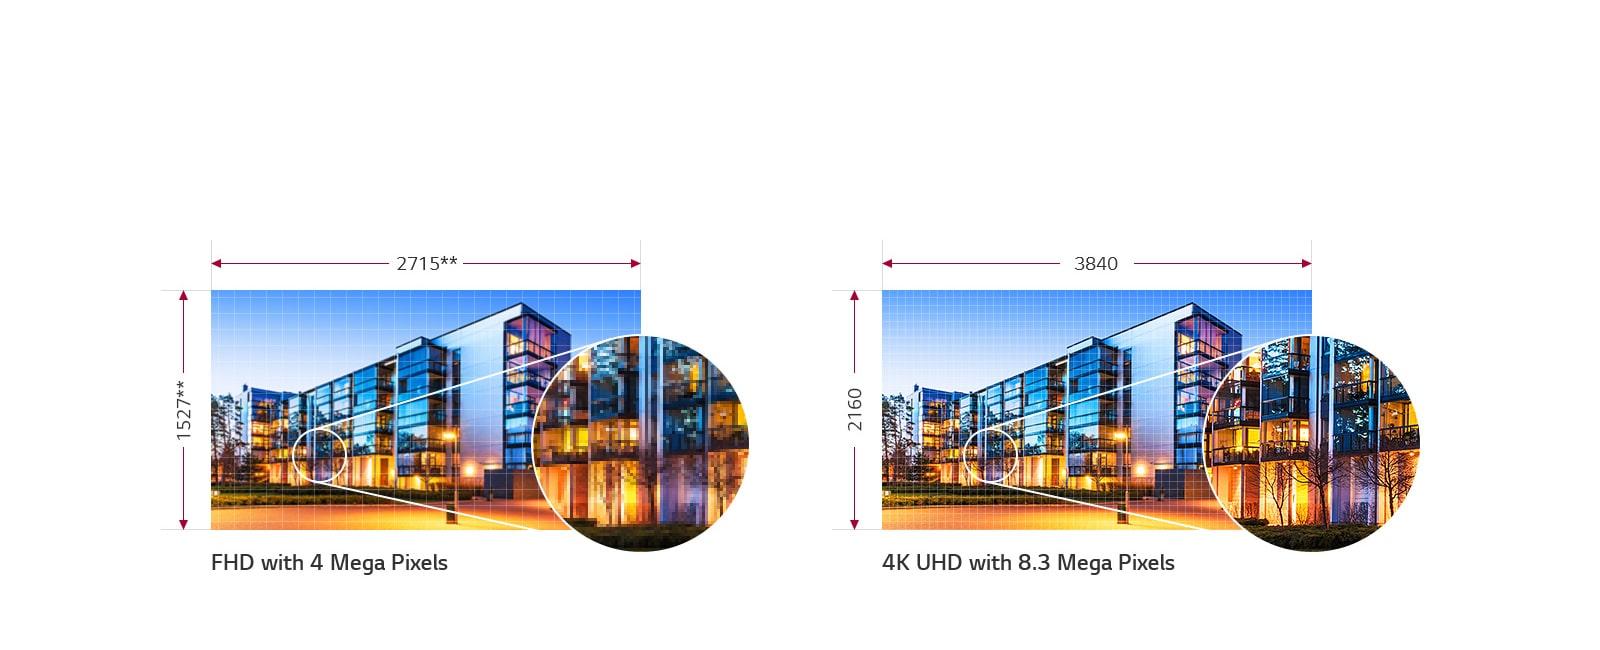 4K UHD with 8.3 Megapixels1